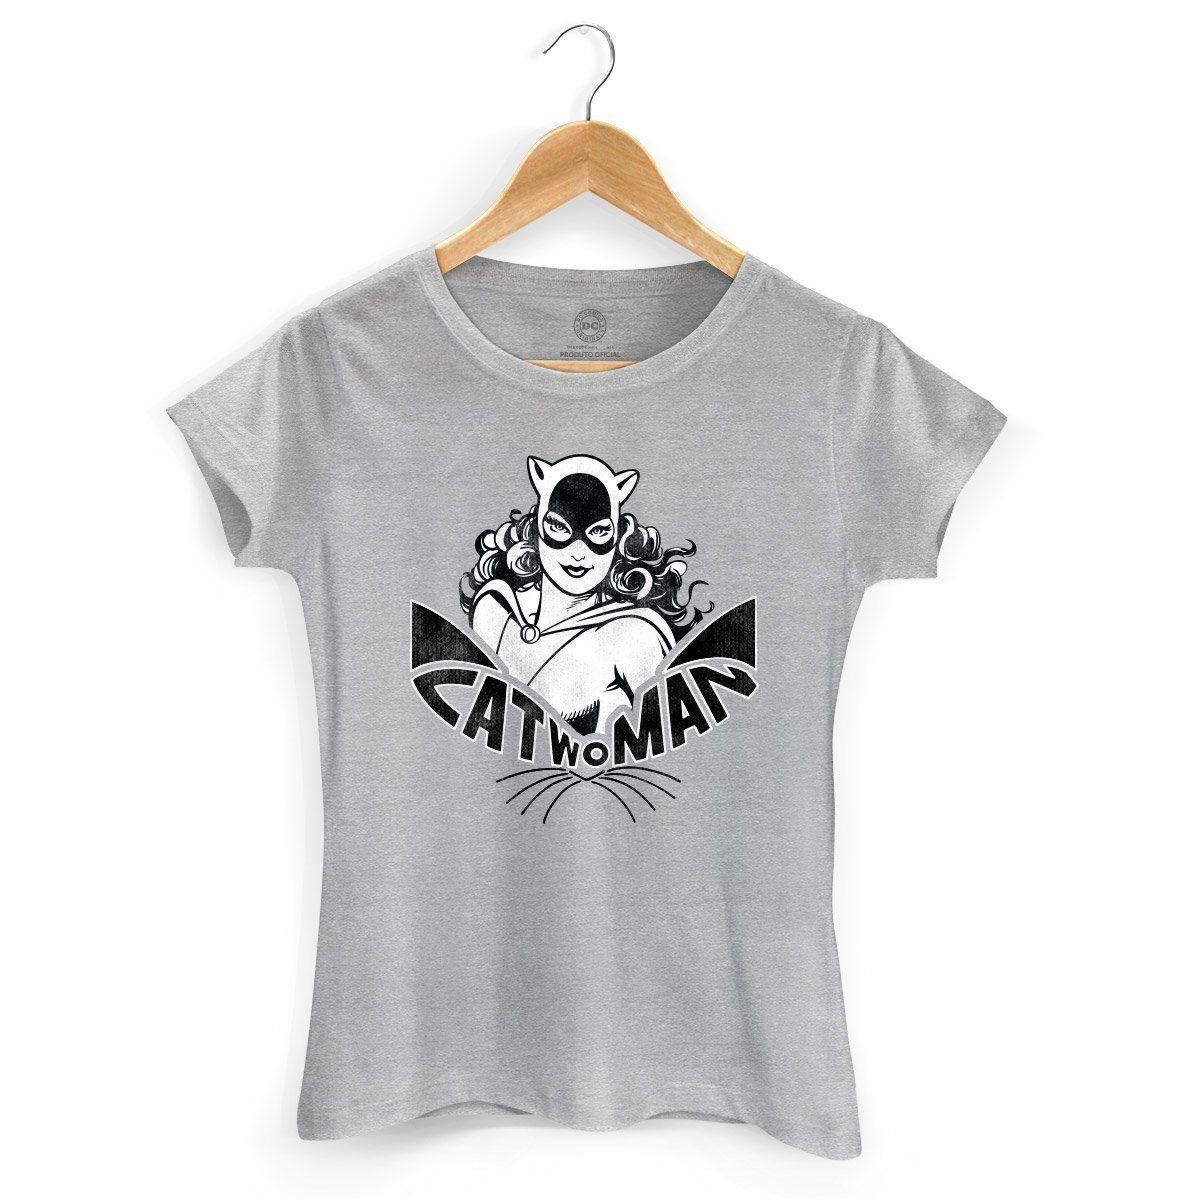 Camiseta Feminina Catwoman Oficial  - bandUP Store Marketplace